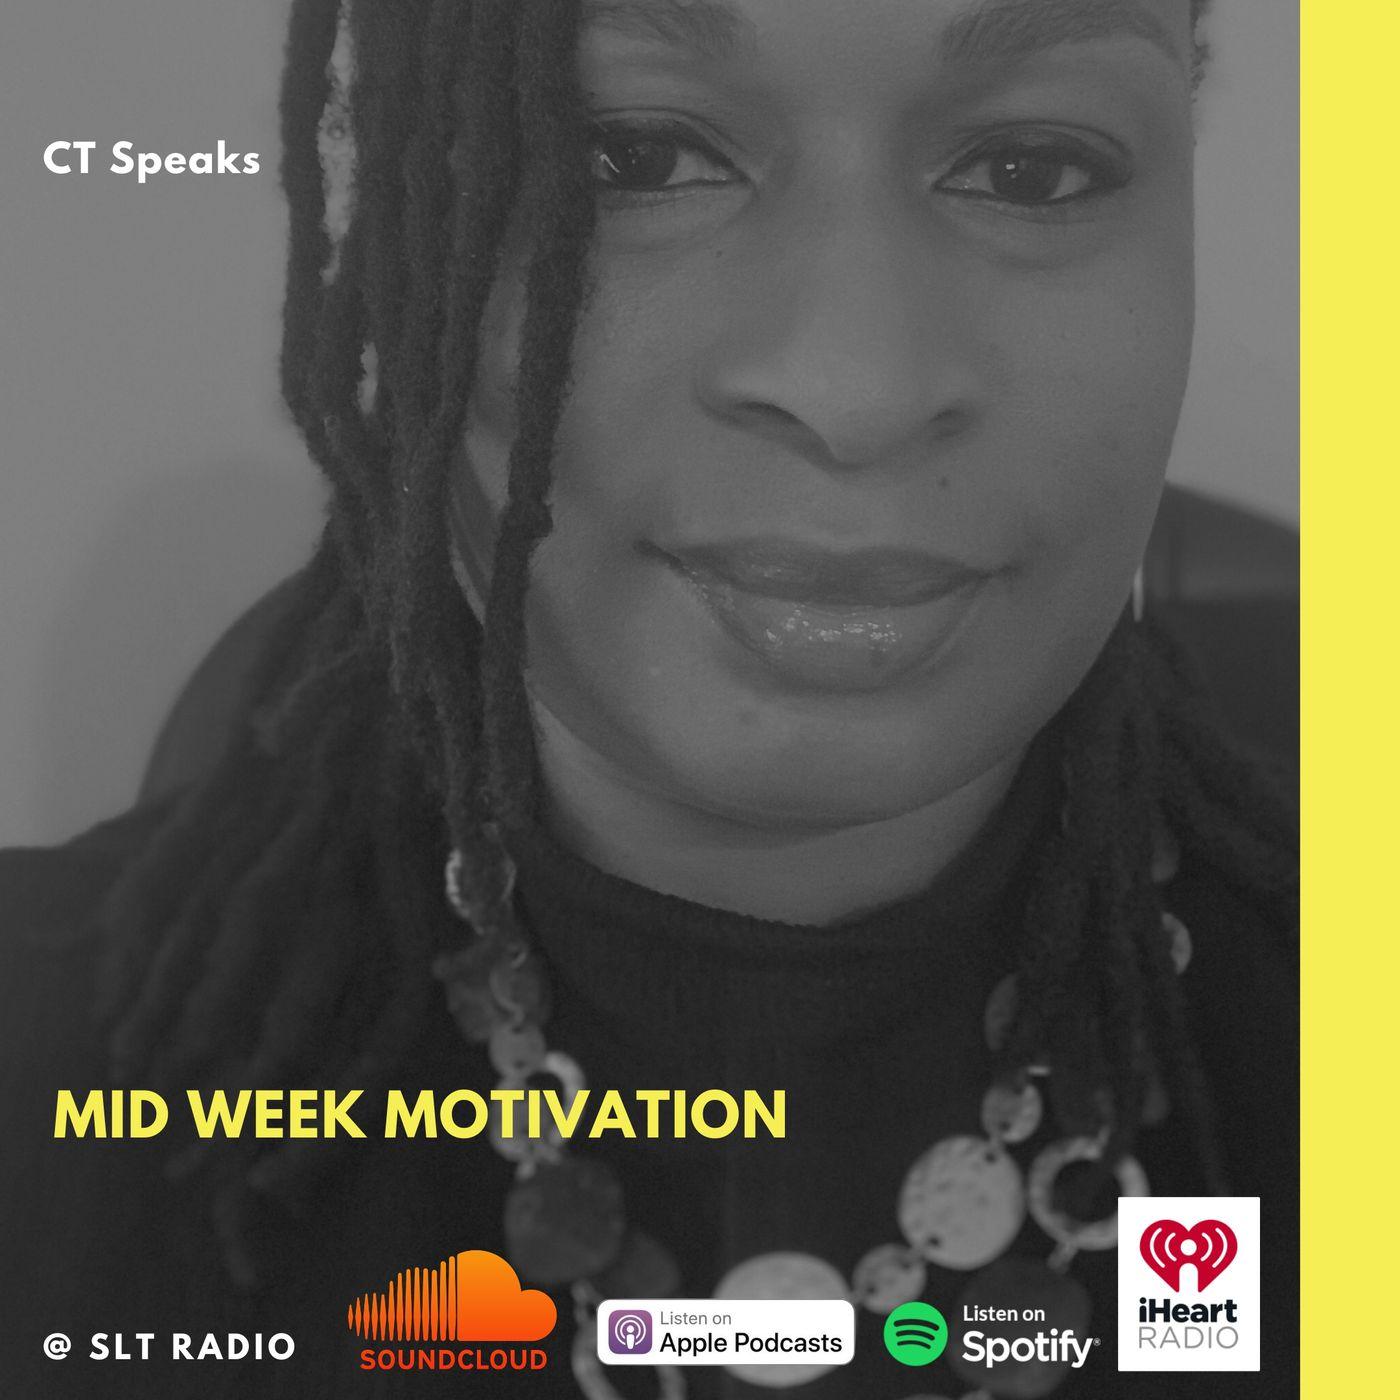 10.7 - GM2Leader - Mid Week Motivation - CT Speaks (Host)